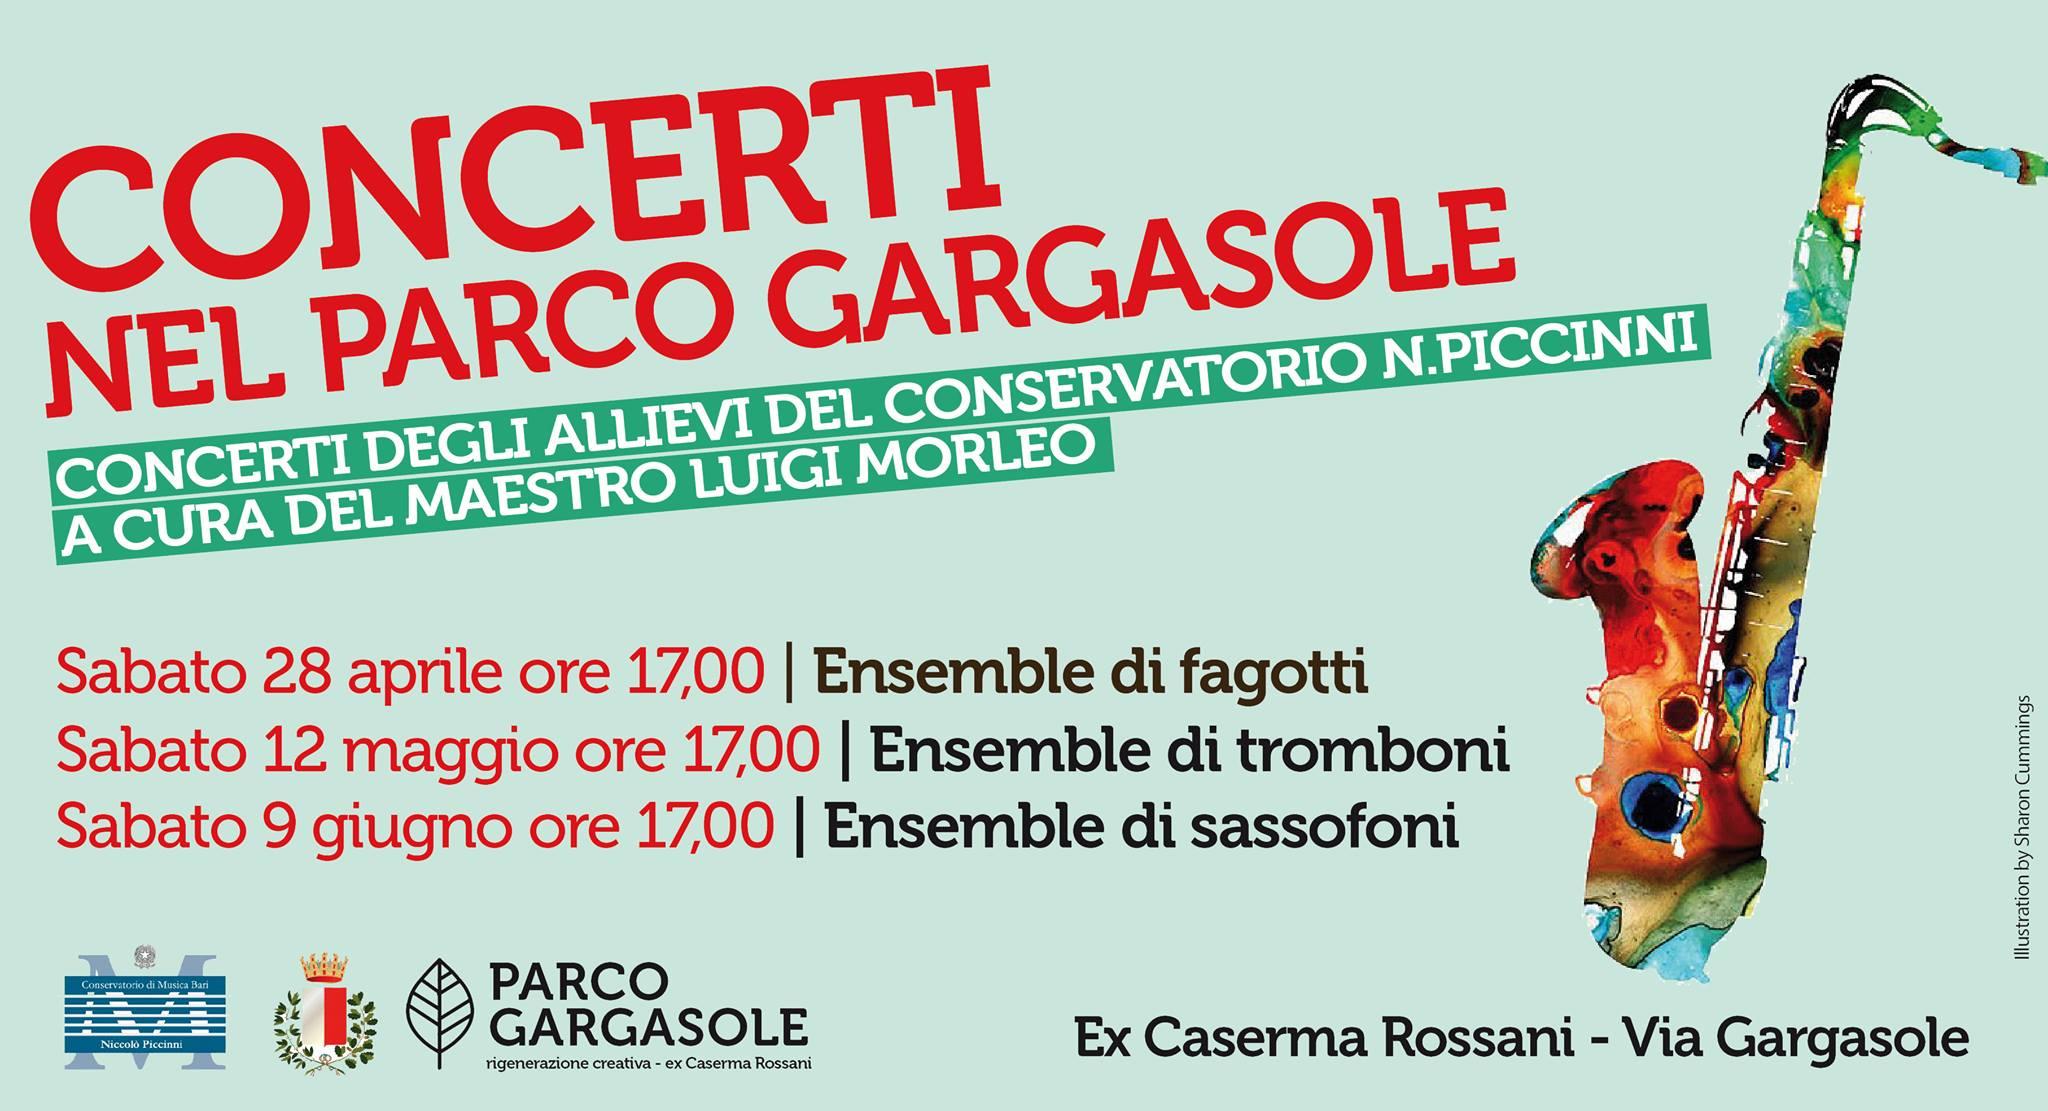 Concerti nel Parco Gargasole